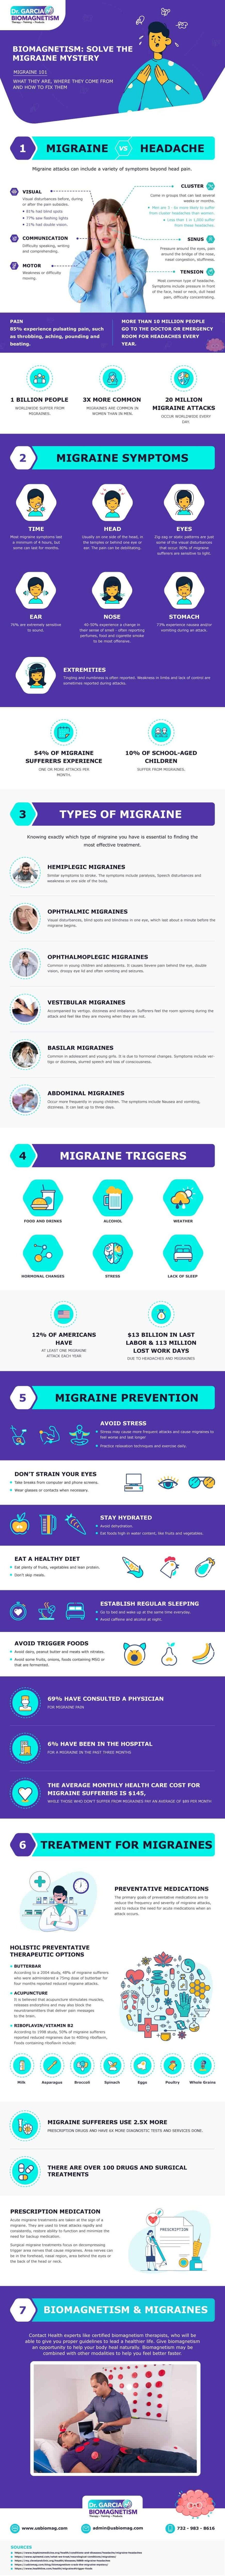 Migraine and Headaches